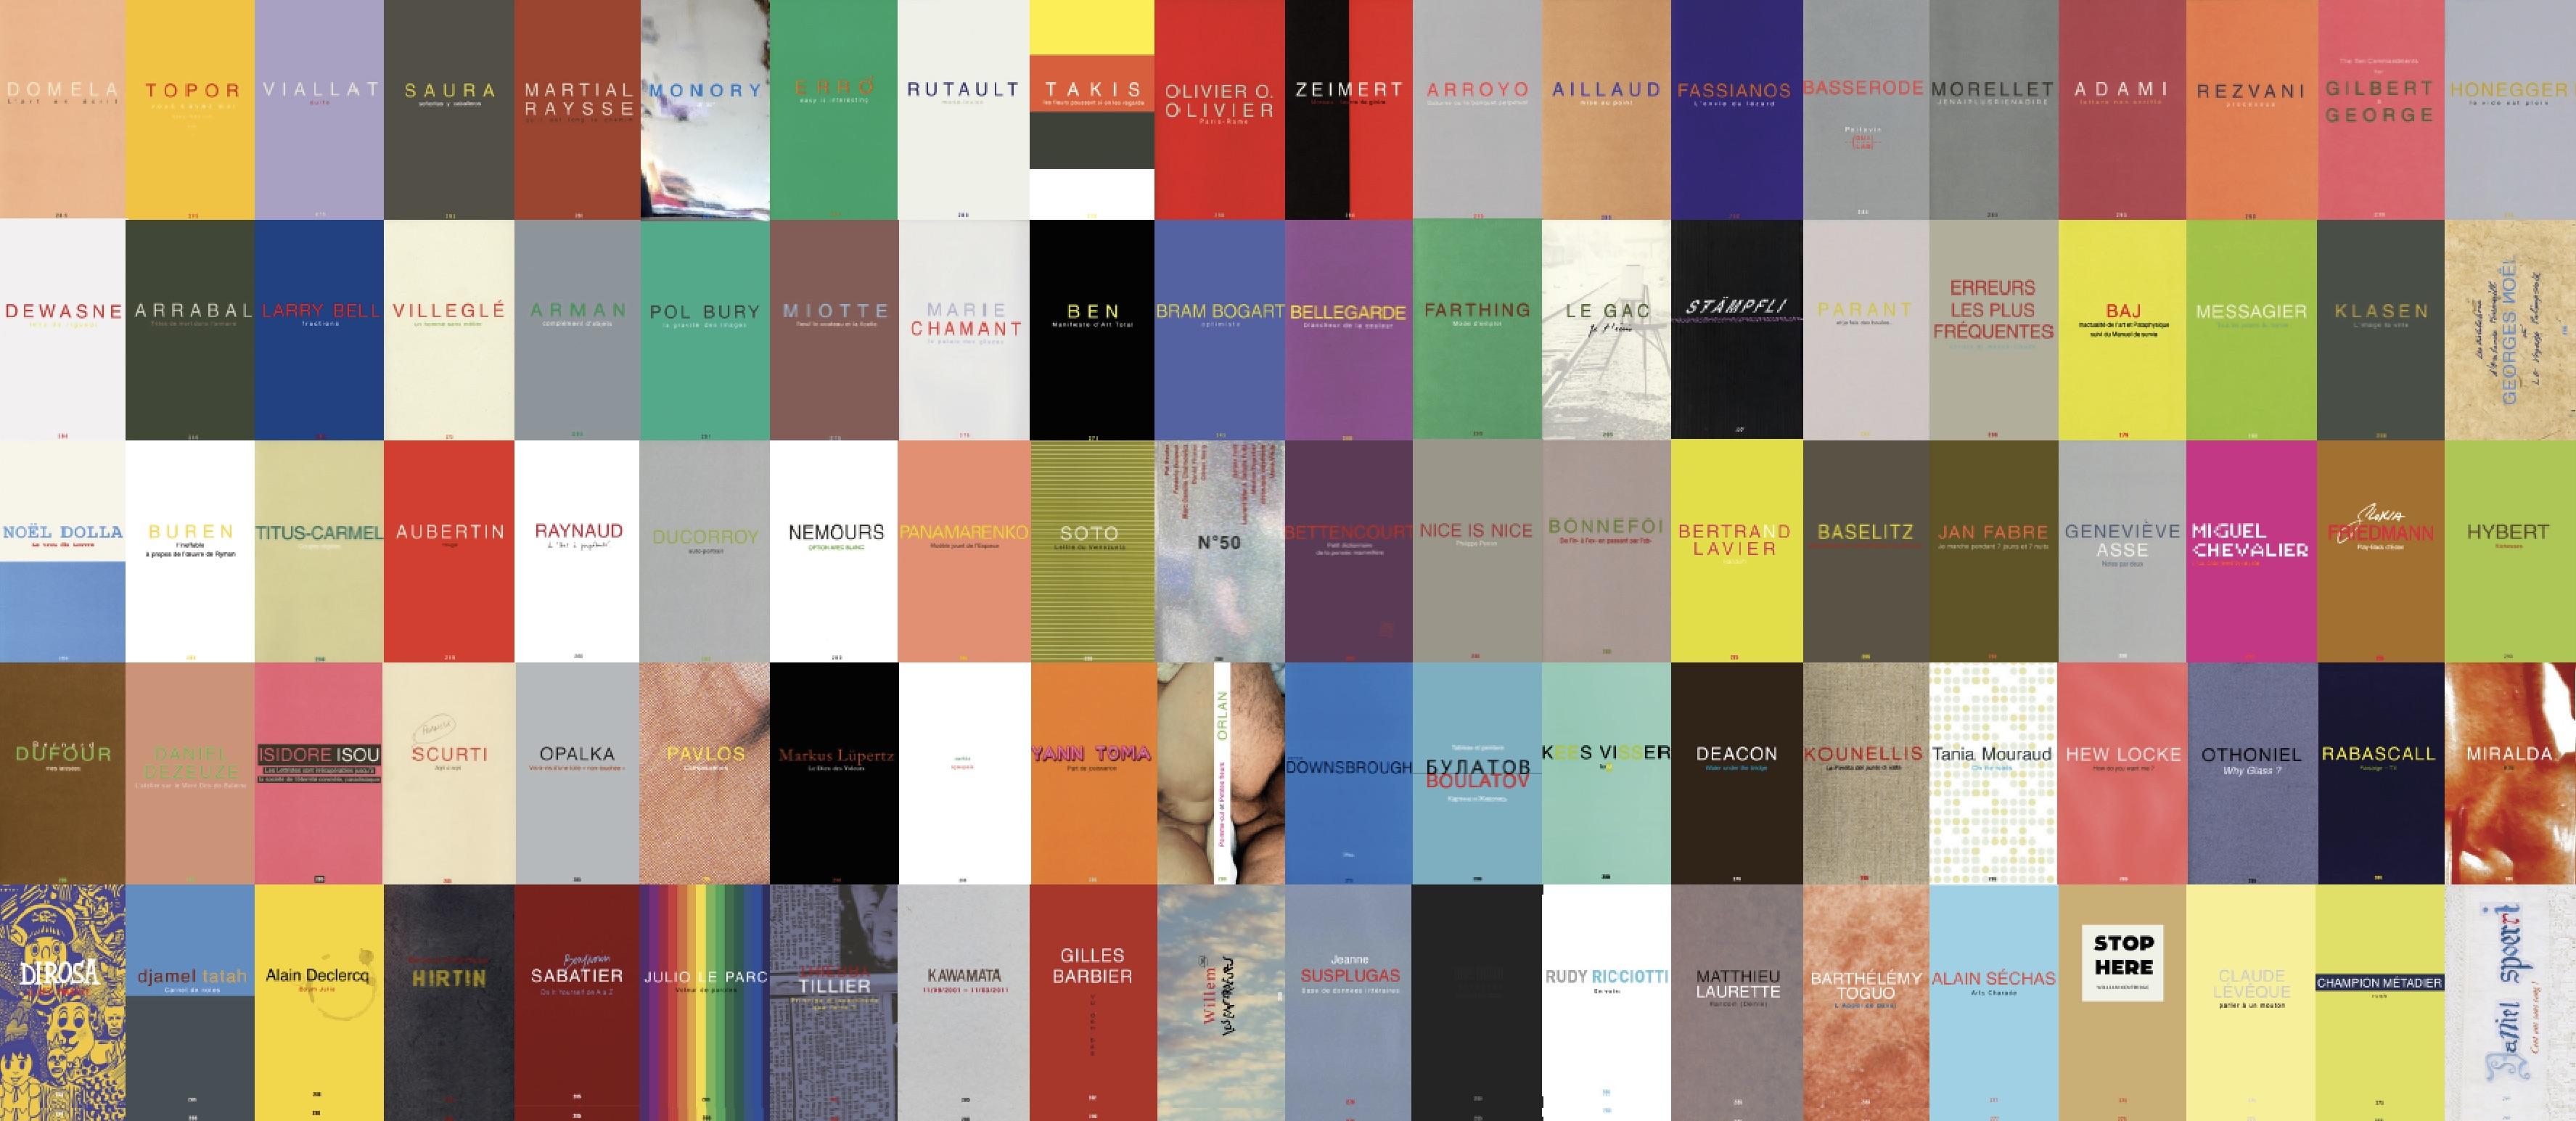 editions Jannink, collection complète